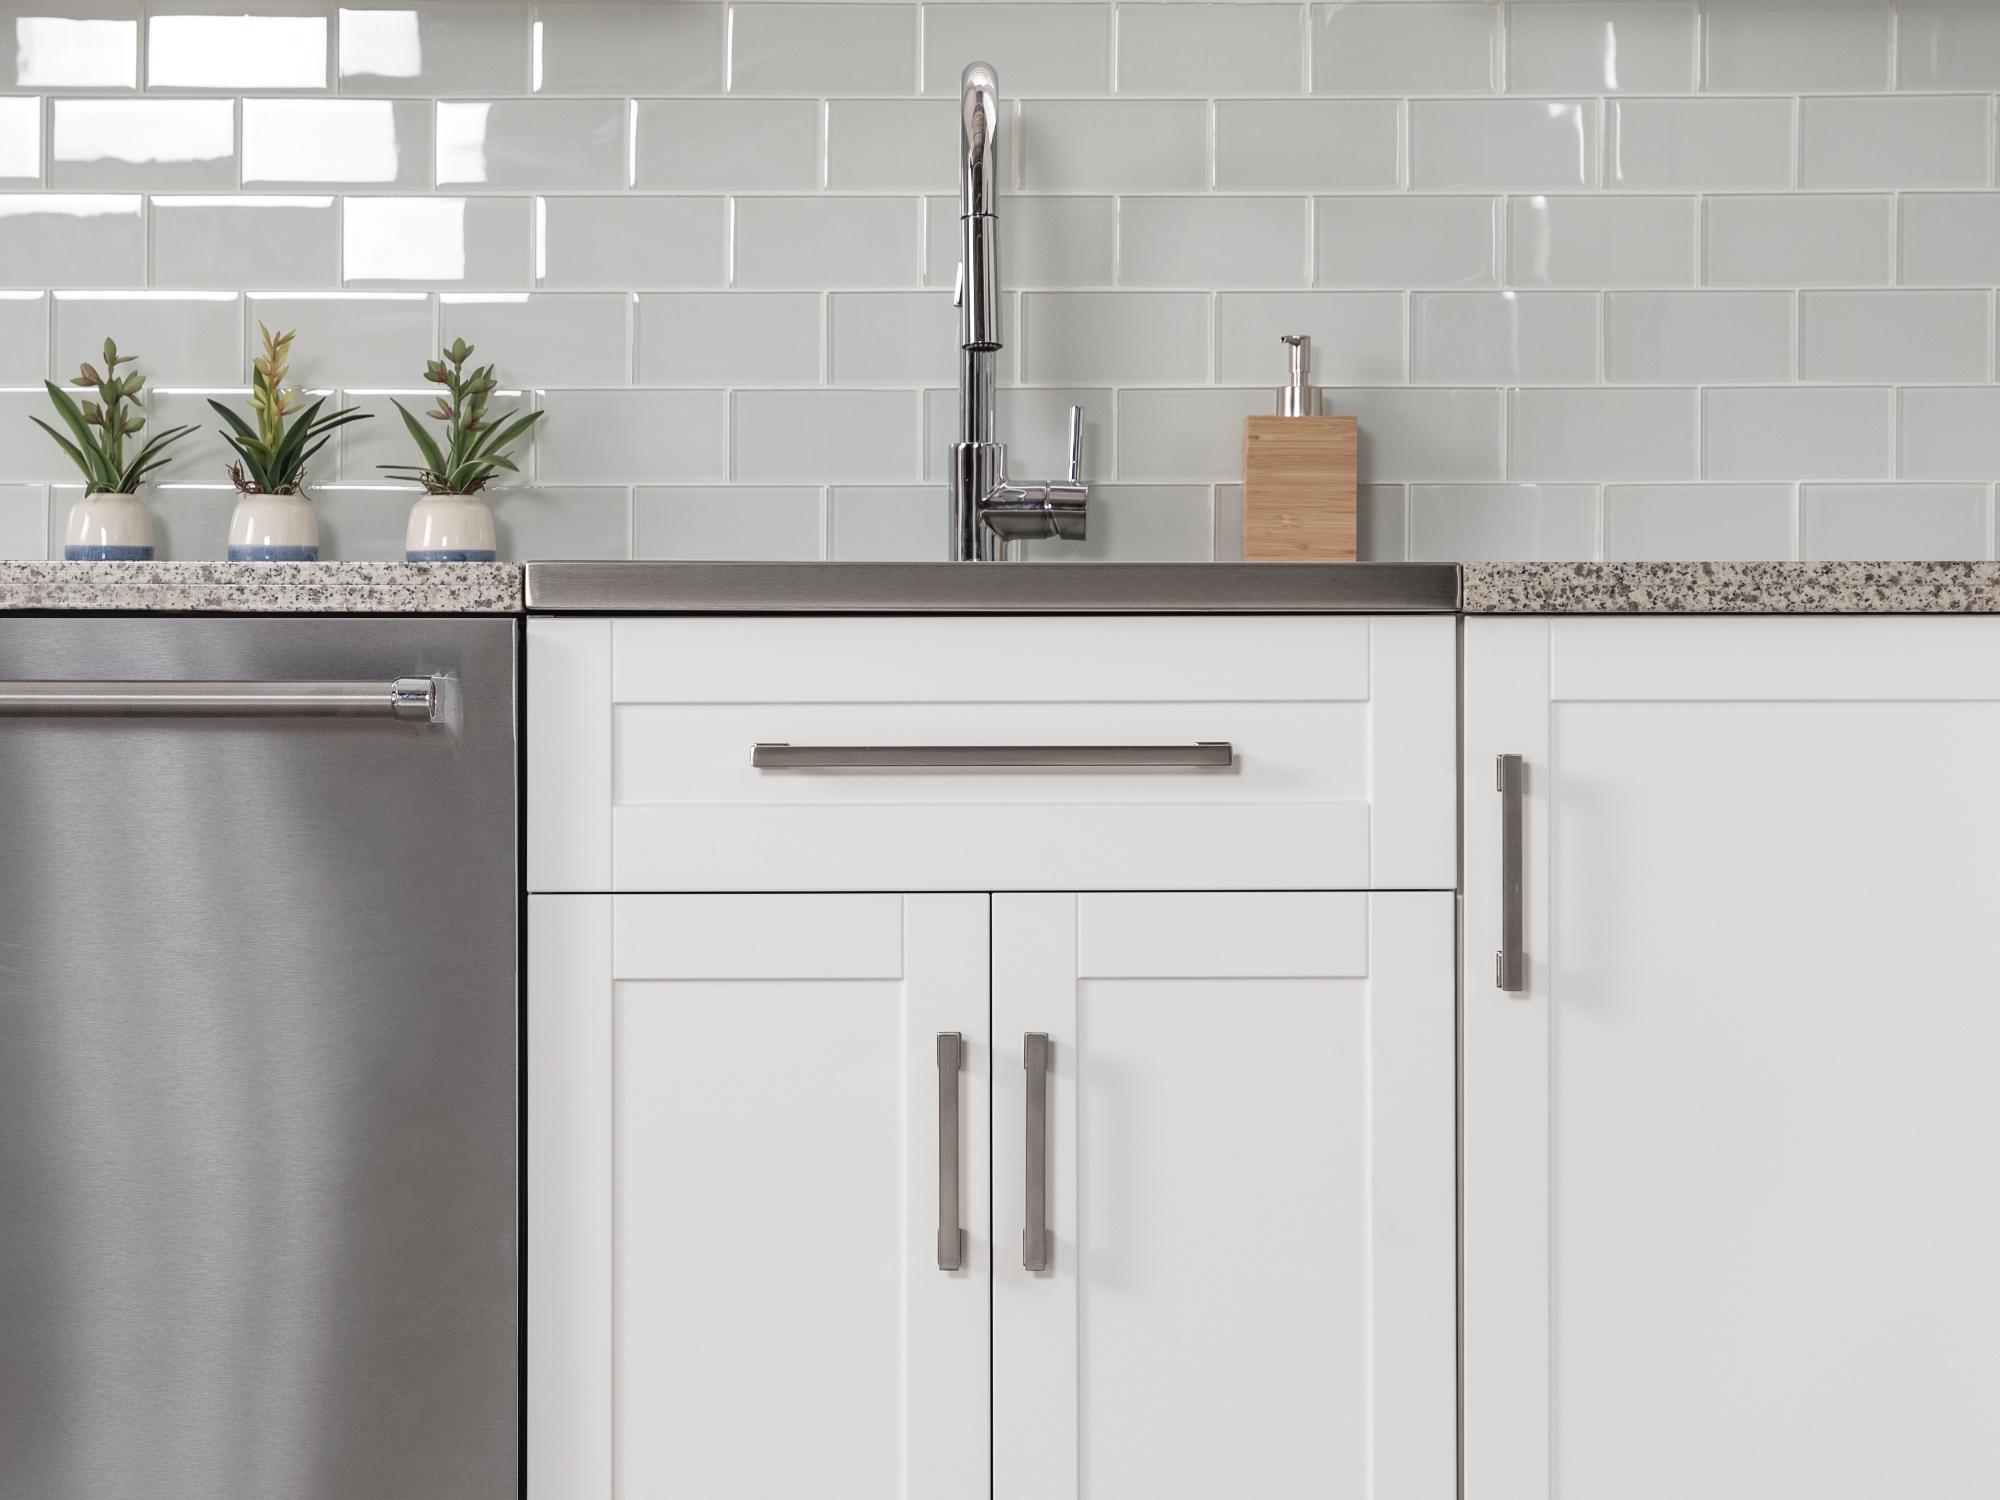 Enter to Win $1,500 Towards a Modular Kitchen Transformation - Remodelista